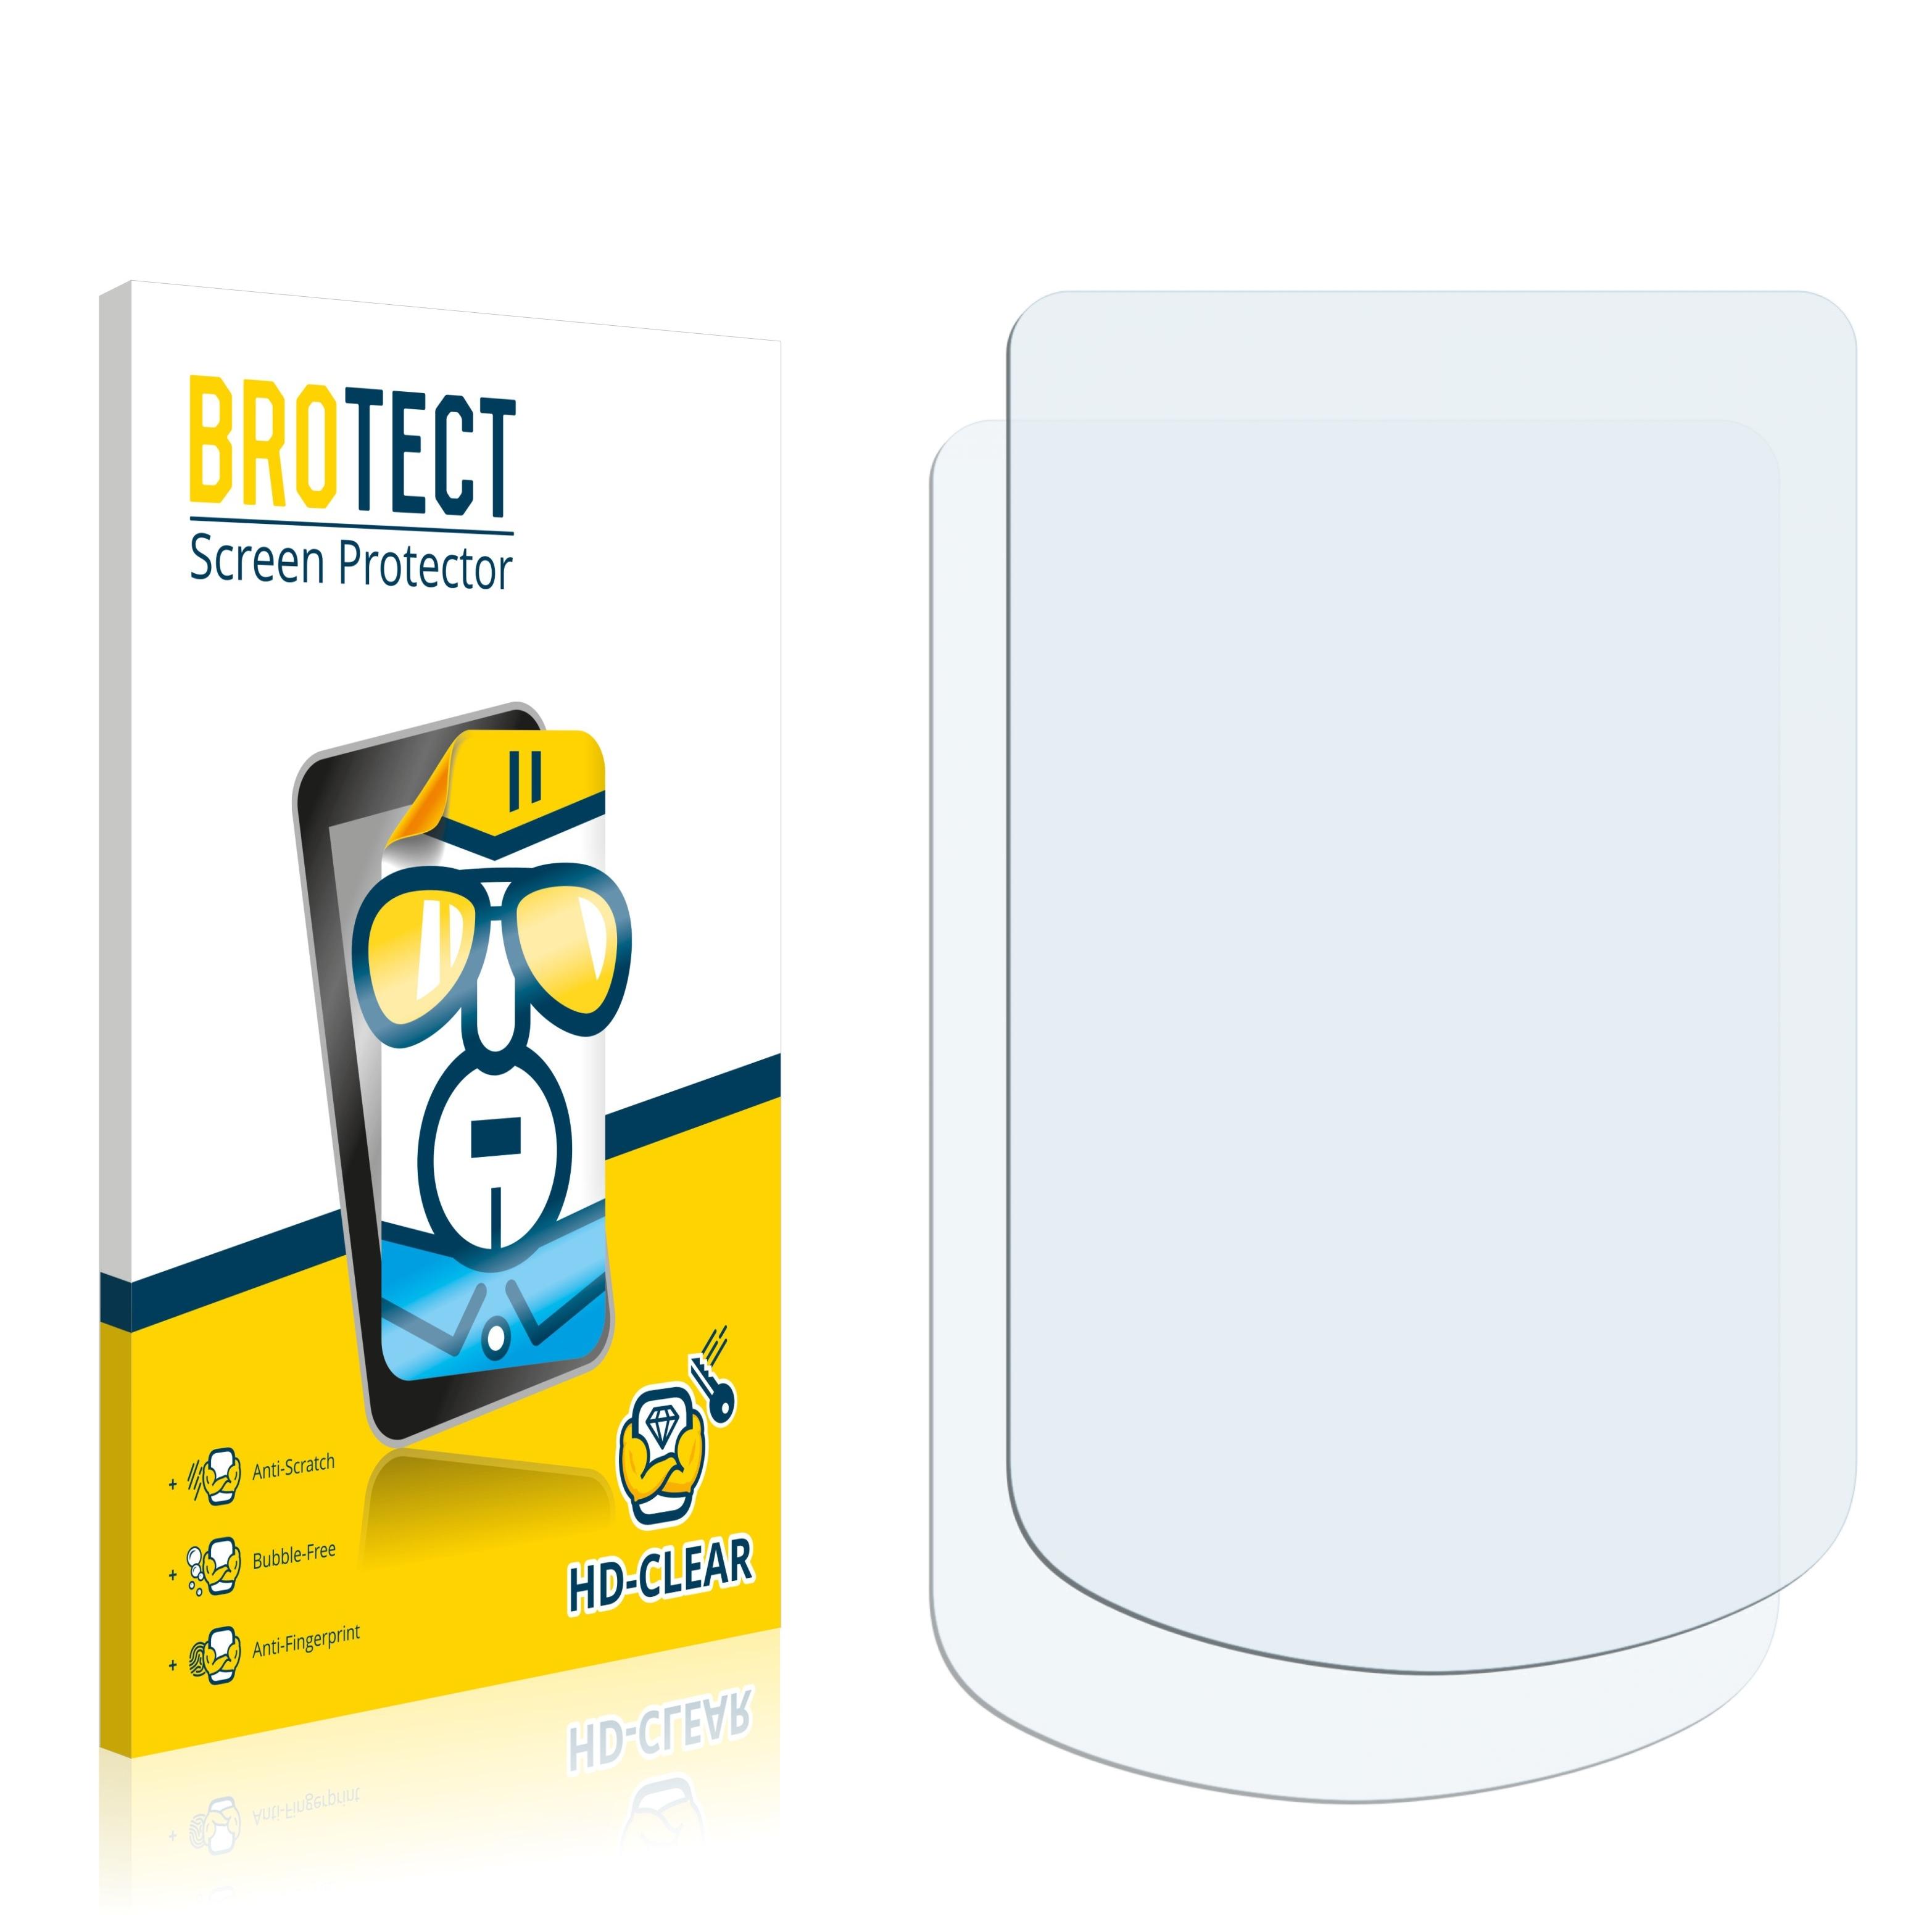 6x Impulse Evo Smart Compact E-Bike Display Screen Protector Plastic Film